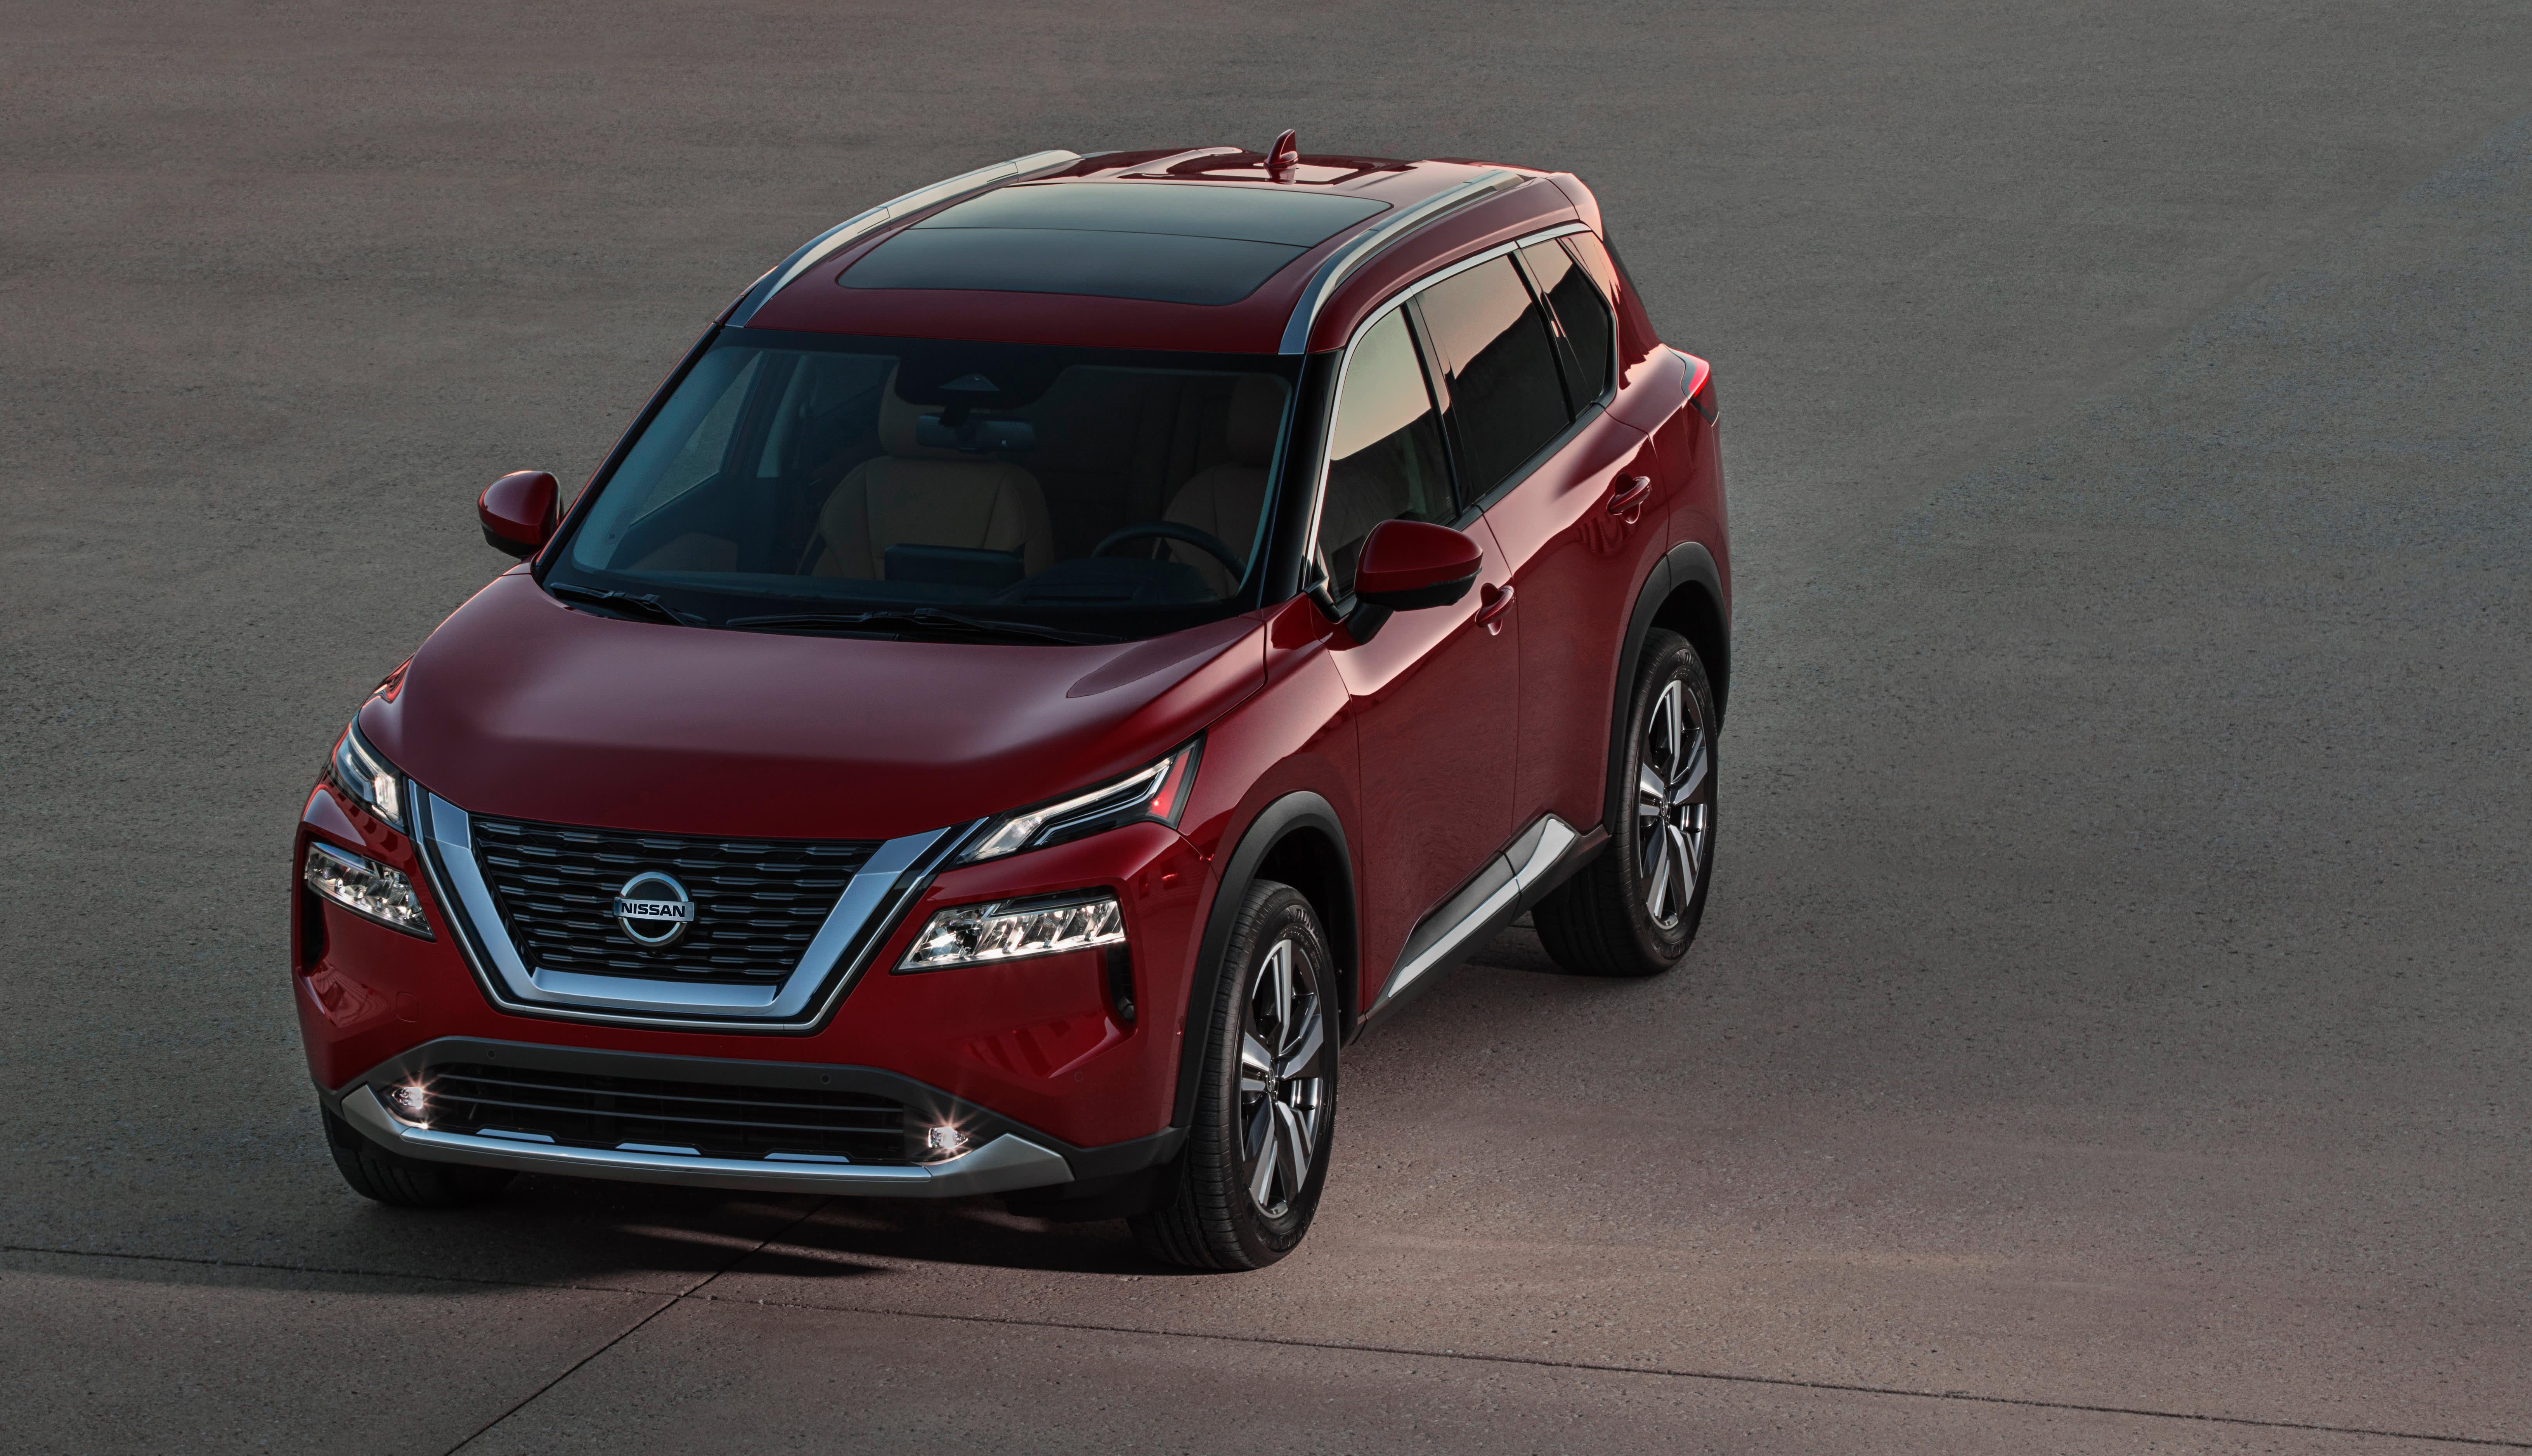 Nissan unveils new Rogue crossover under global turnaround plan